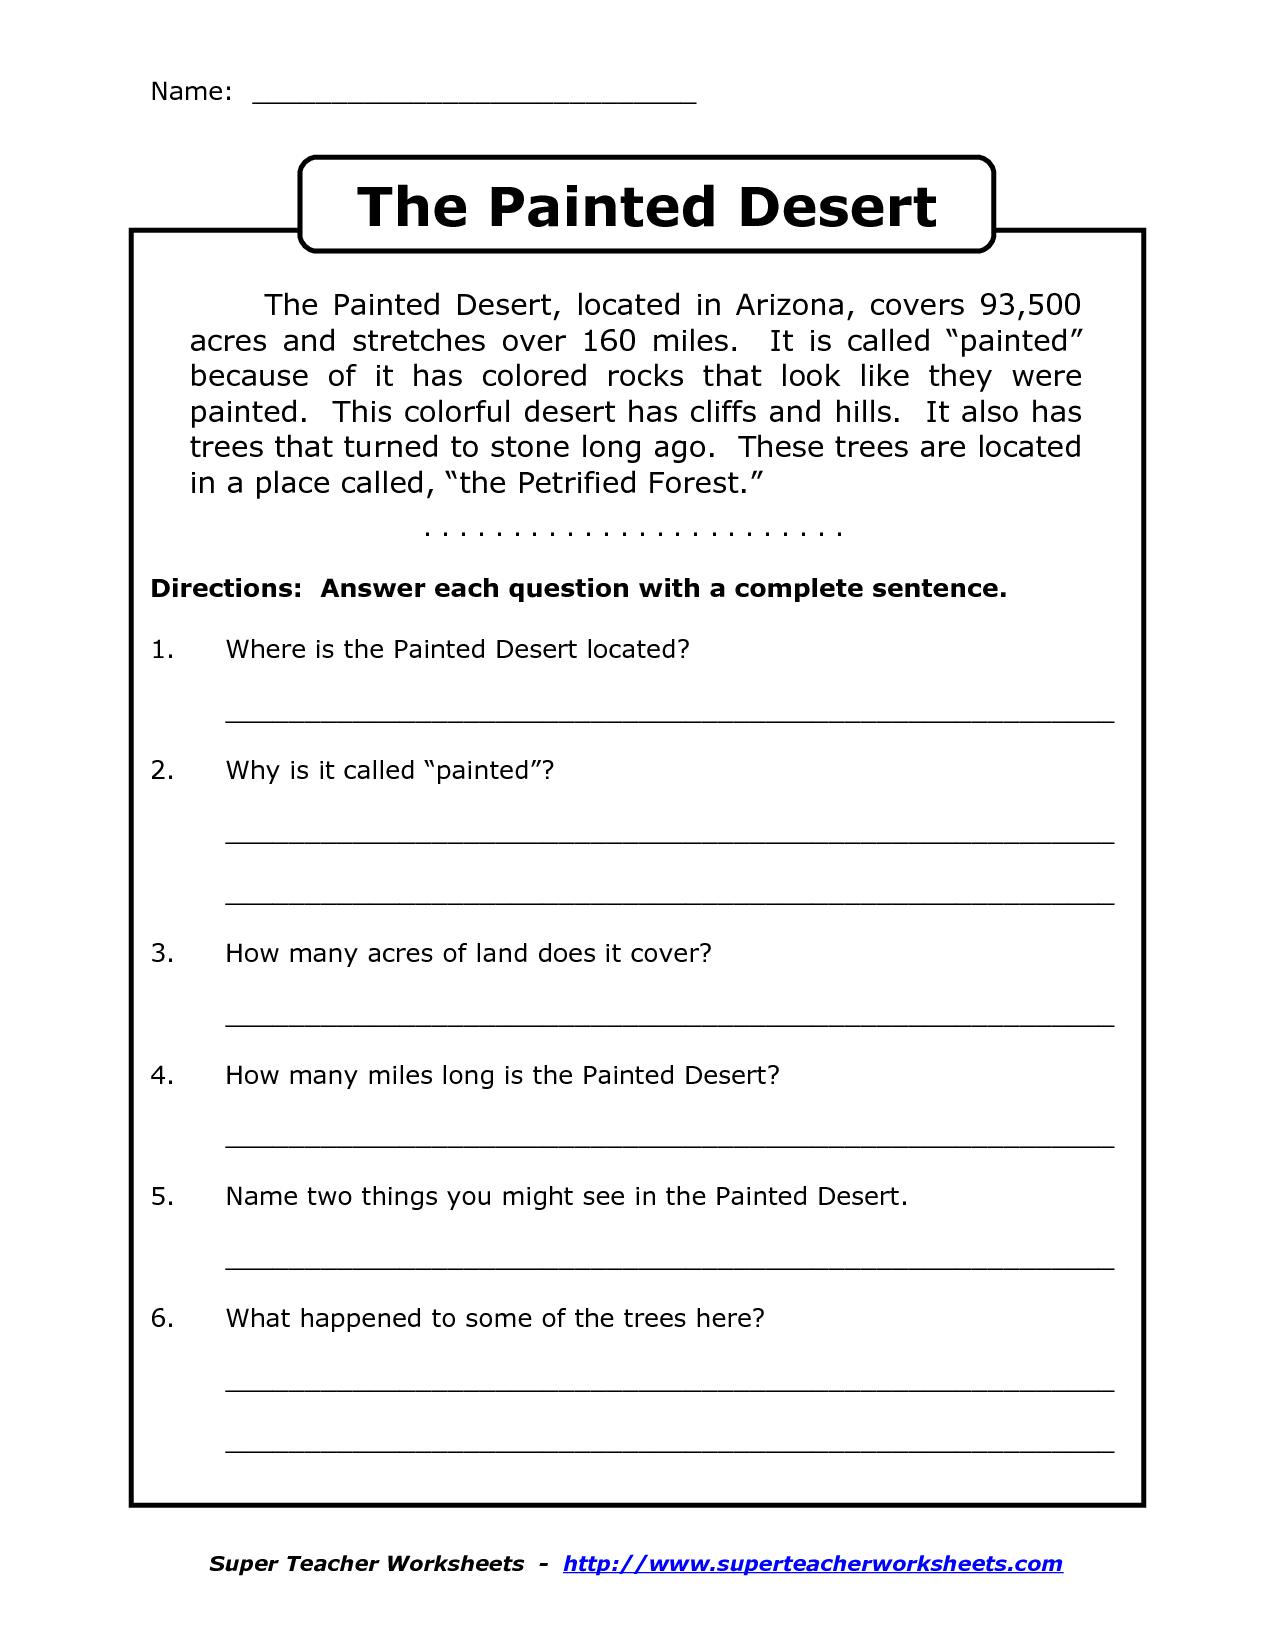 Reading Worksheets For 4Th Grade | Reading Comprehension Worksheets - Free Printable 4Th Grade Reading Worksheets